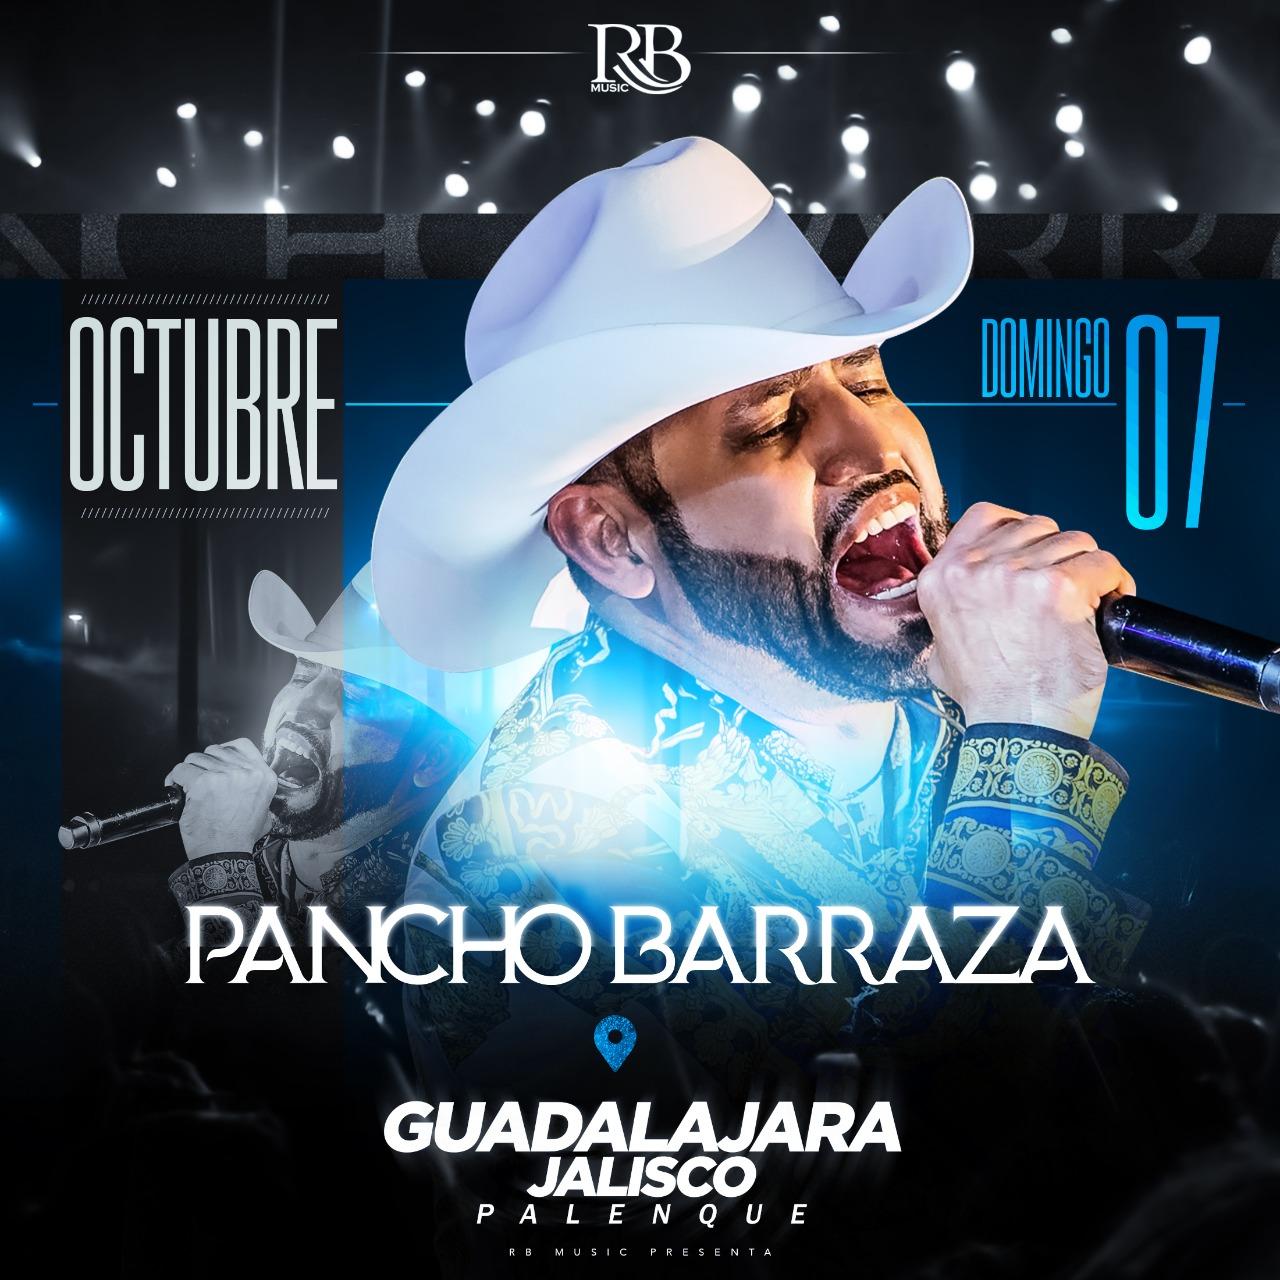 Pancho Barraza / Palenque Fiestas de Octubre